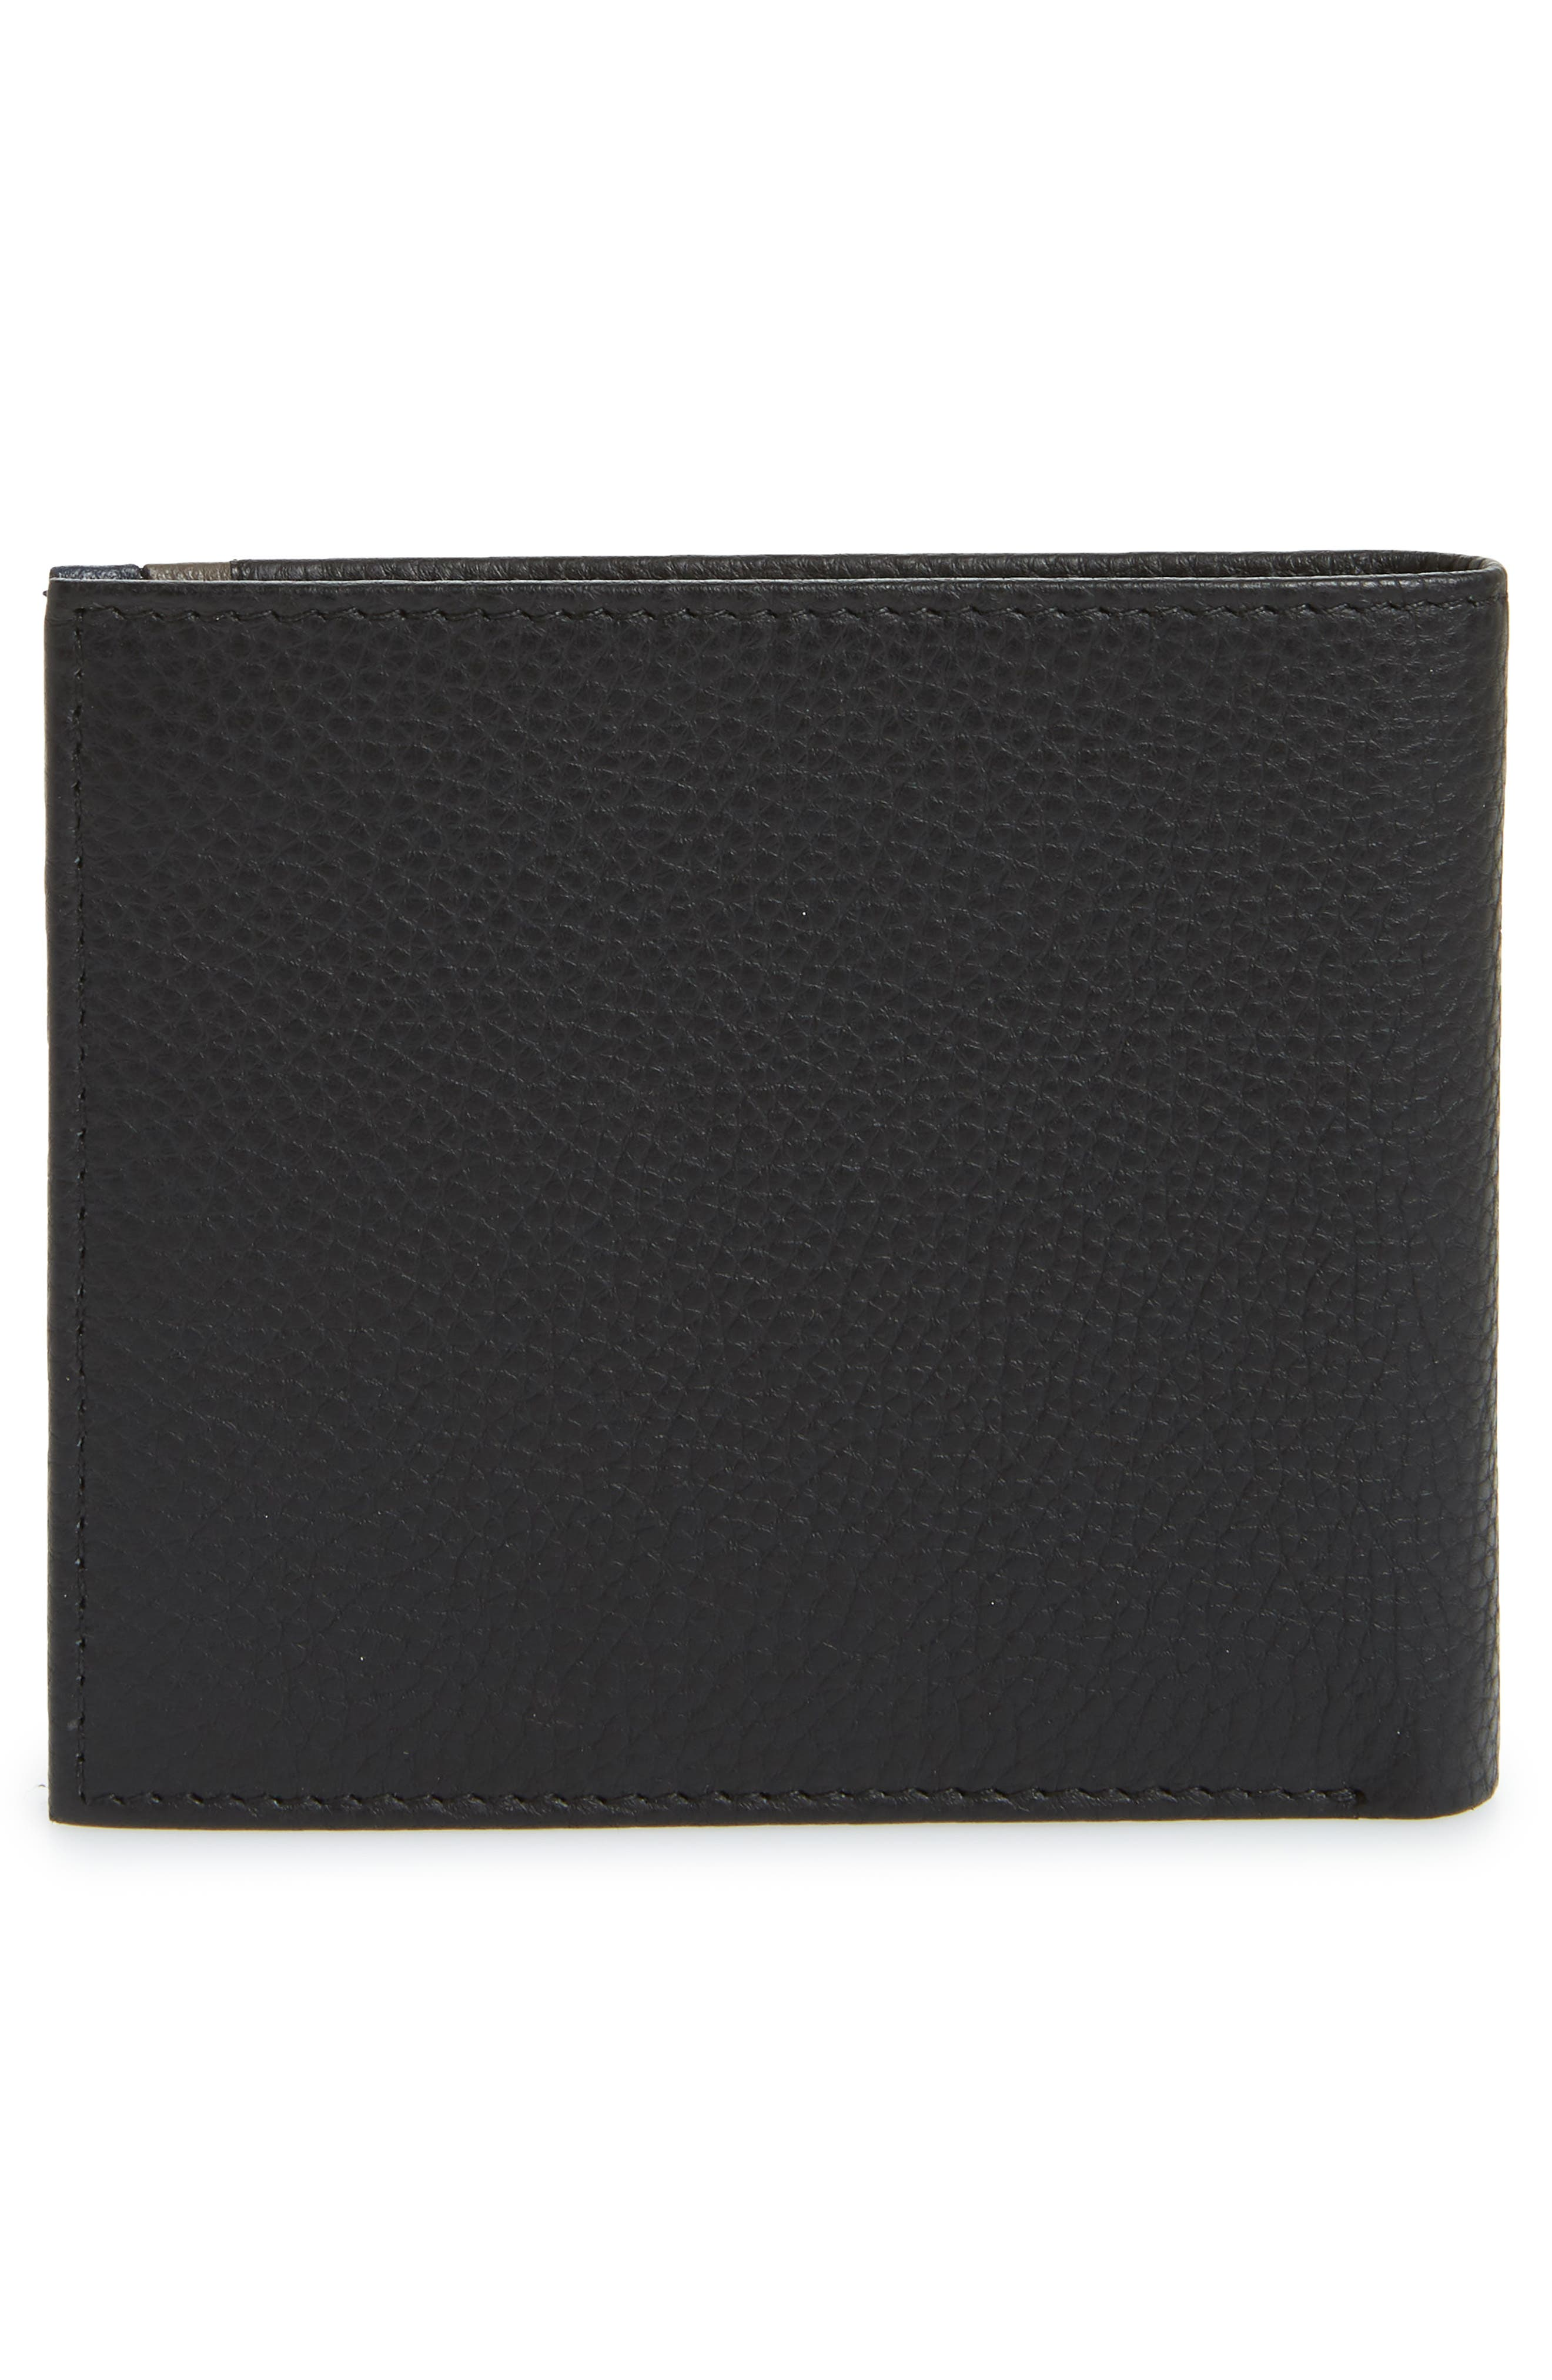 Alternate Image 3  - Ted Baker London Snapper Colored Leather Wallet